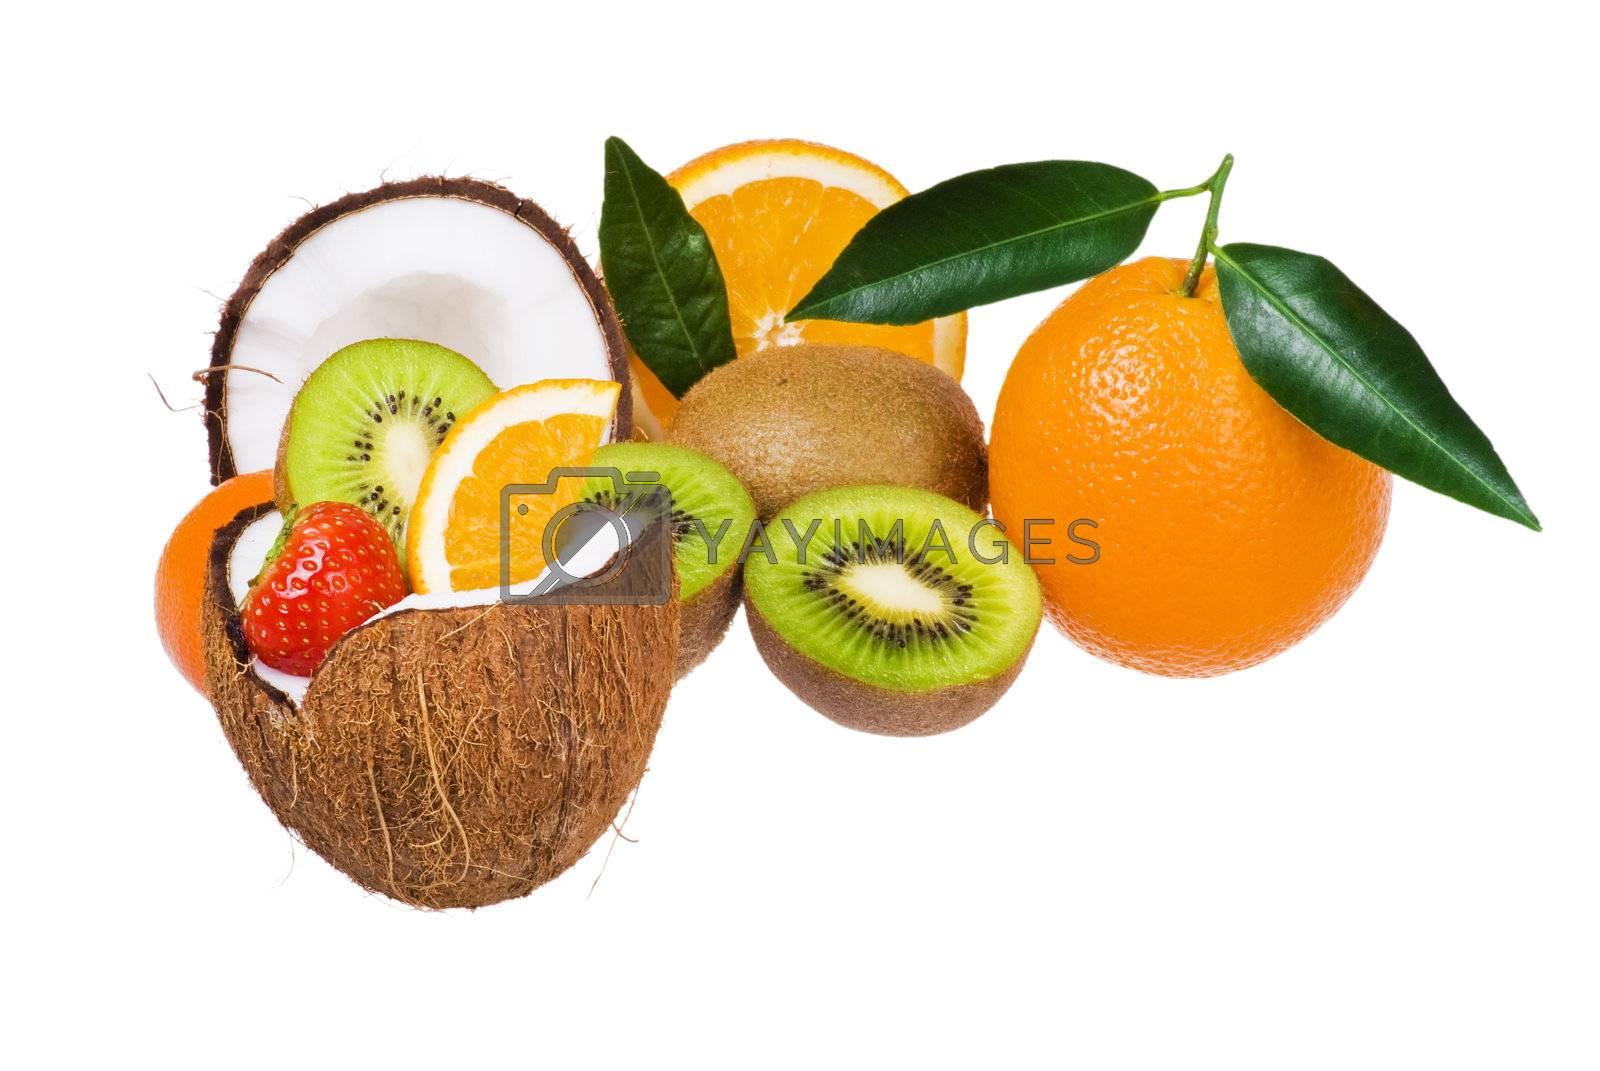 Exotic fruits by caldix